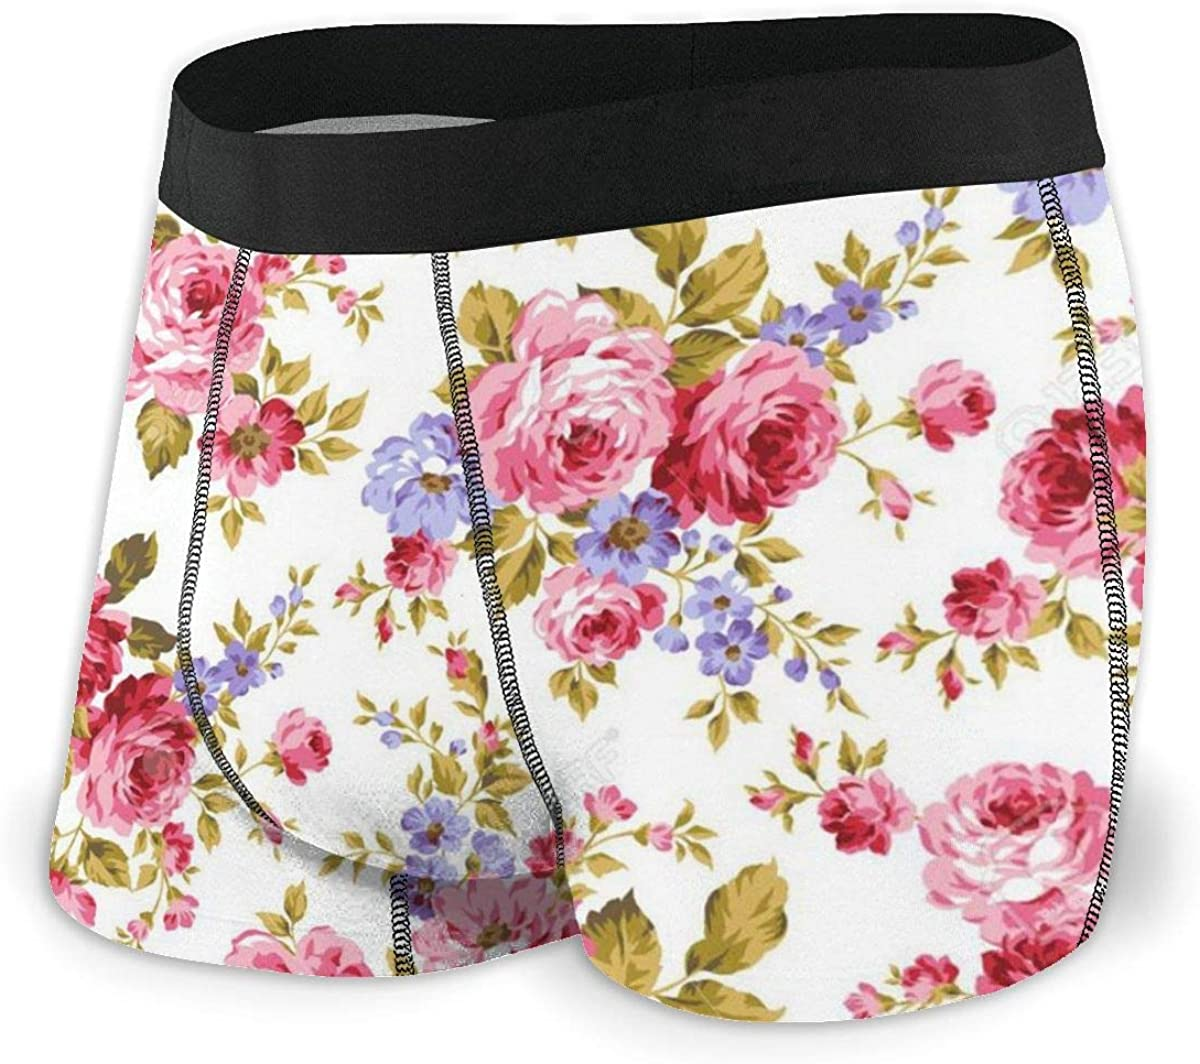 Mens Boxer Briefs Rose Floral Flowers Beautiful Cute Breathable Underwear